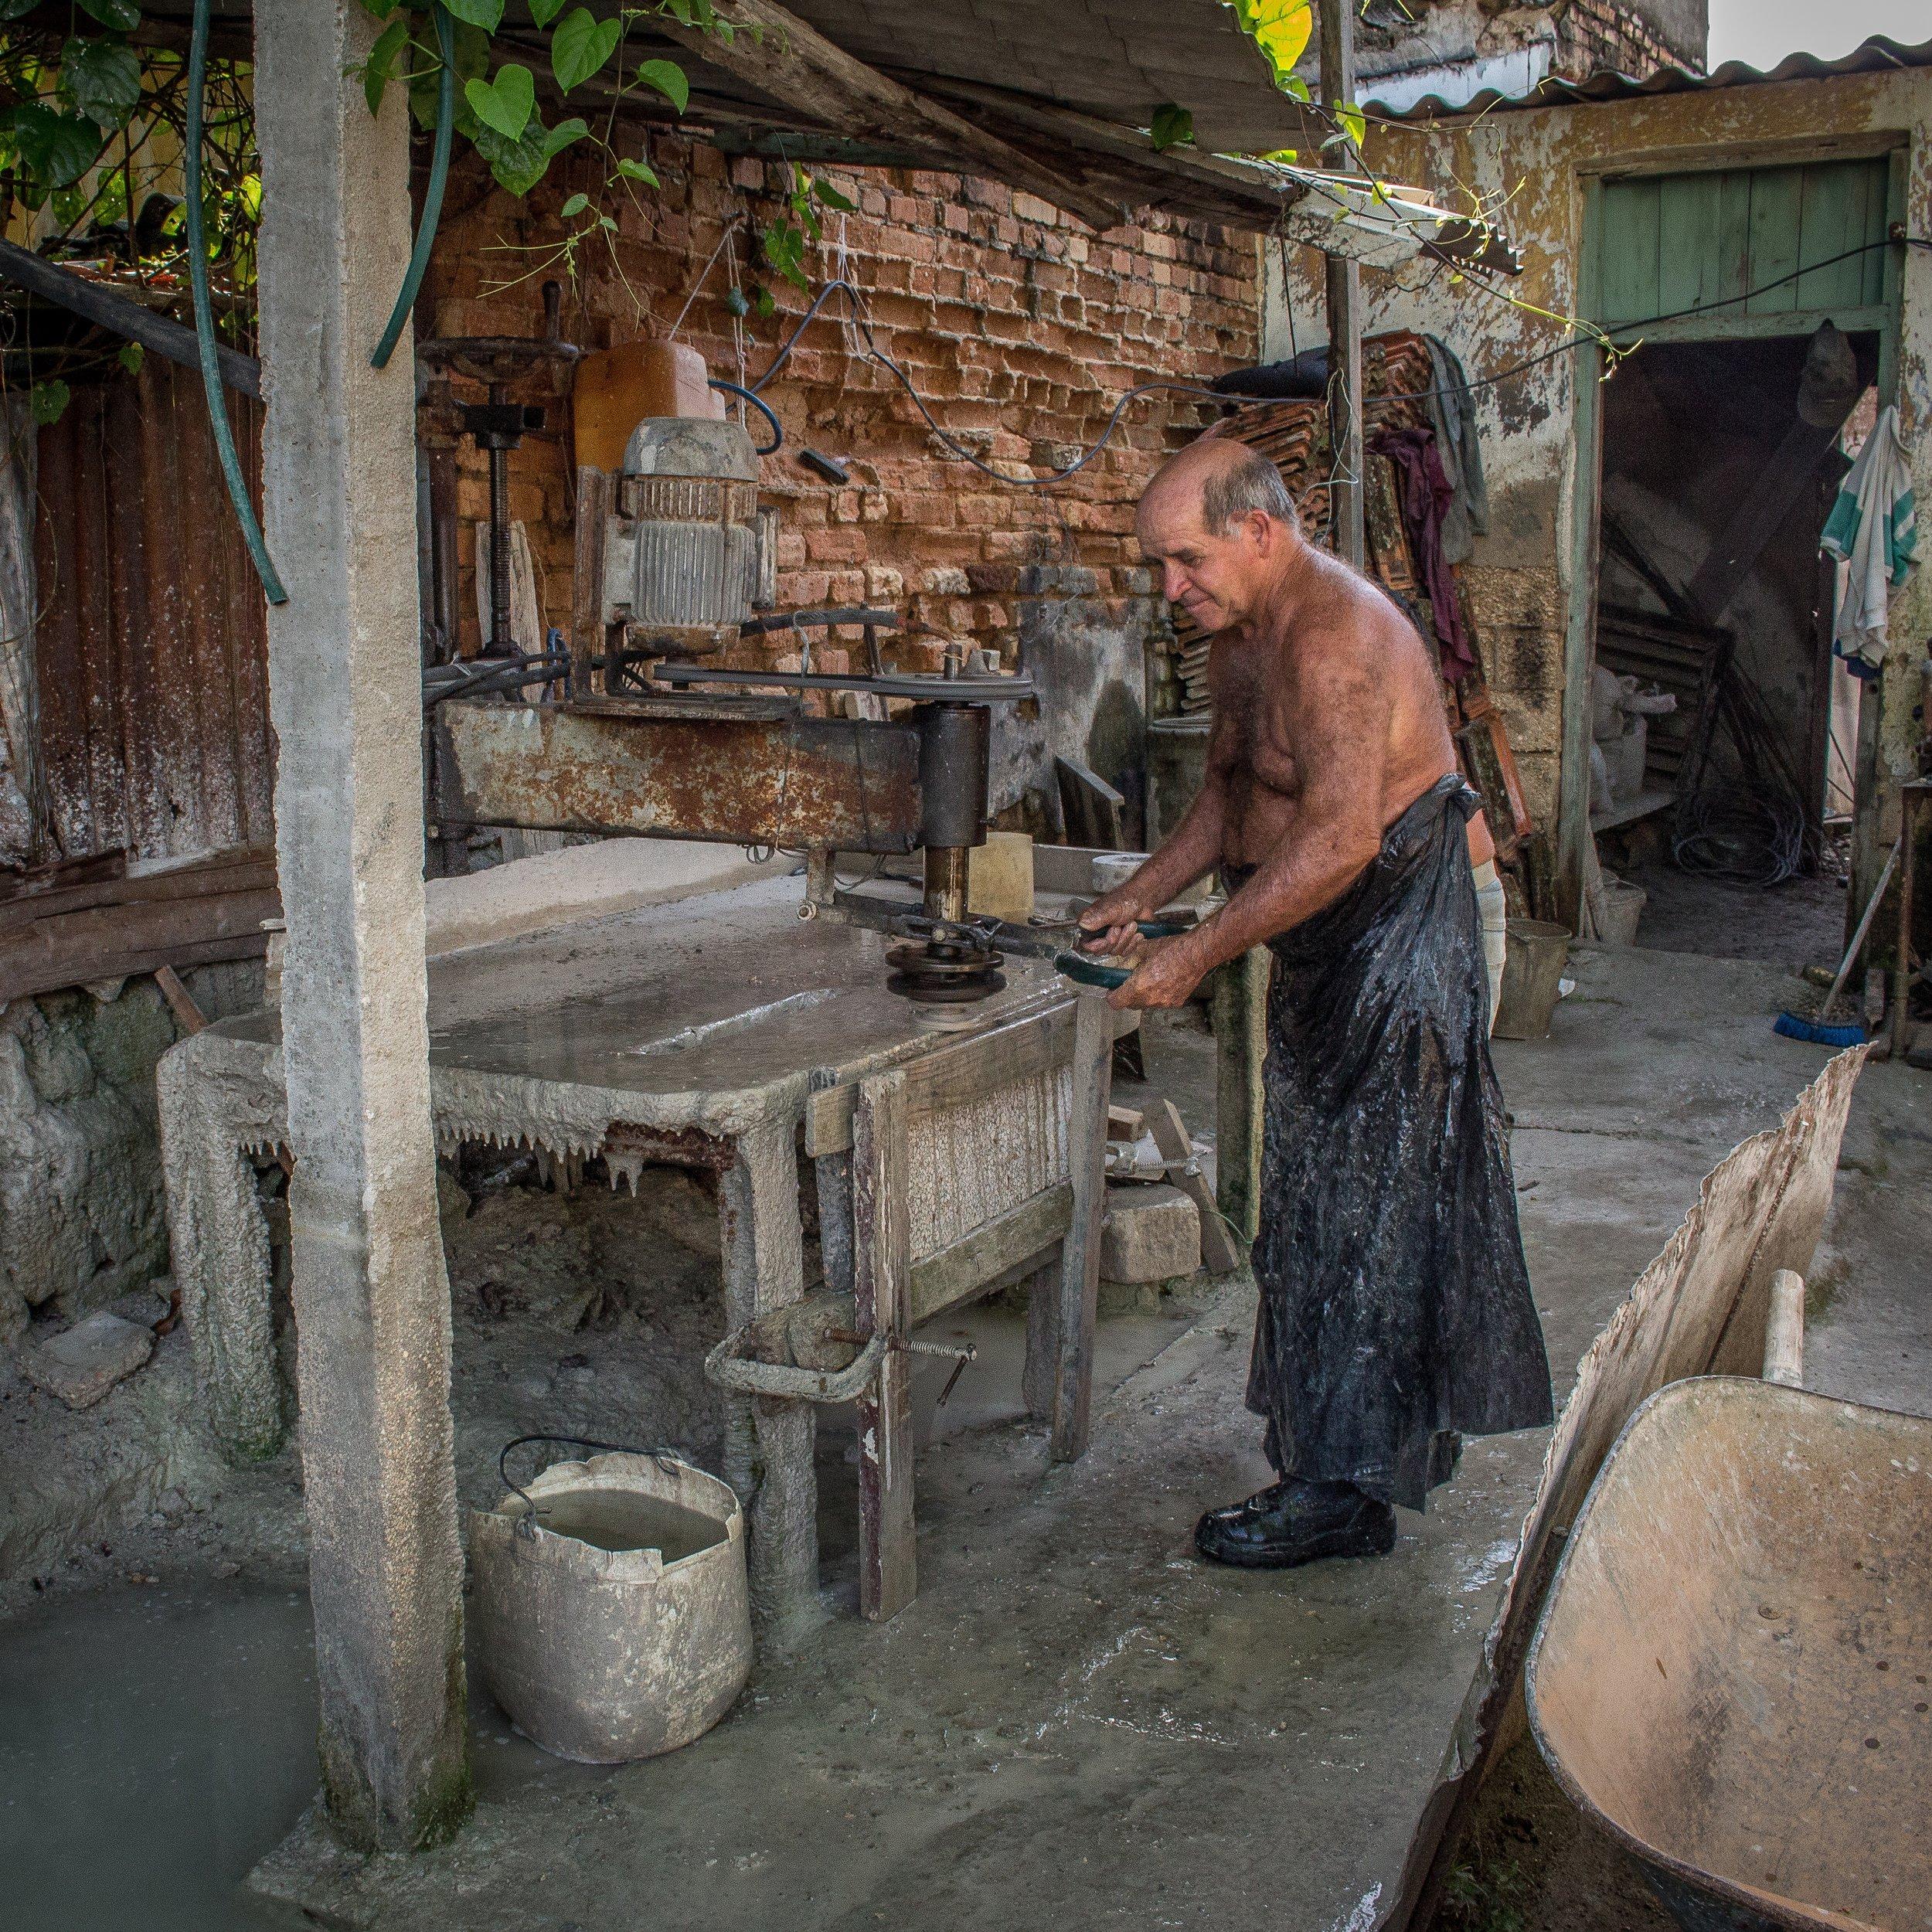 Armando, working in his shop